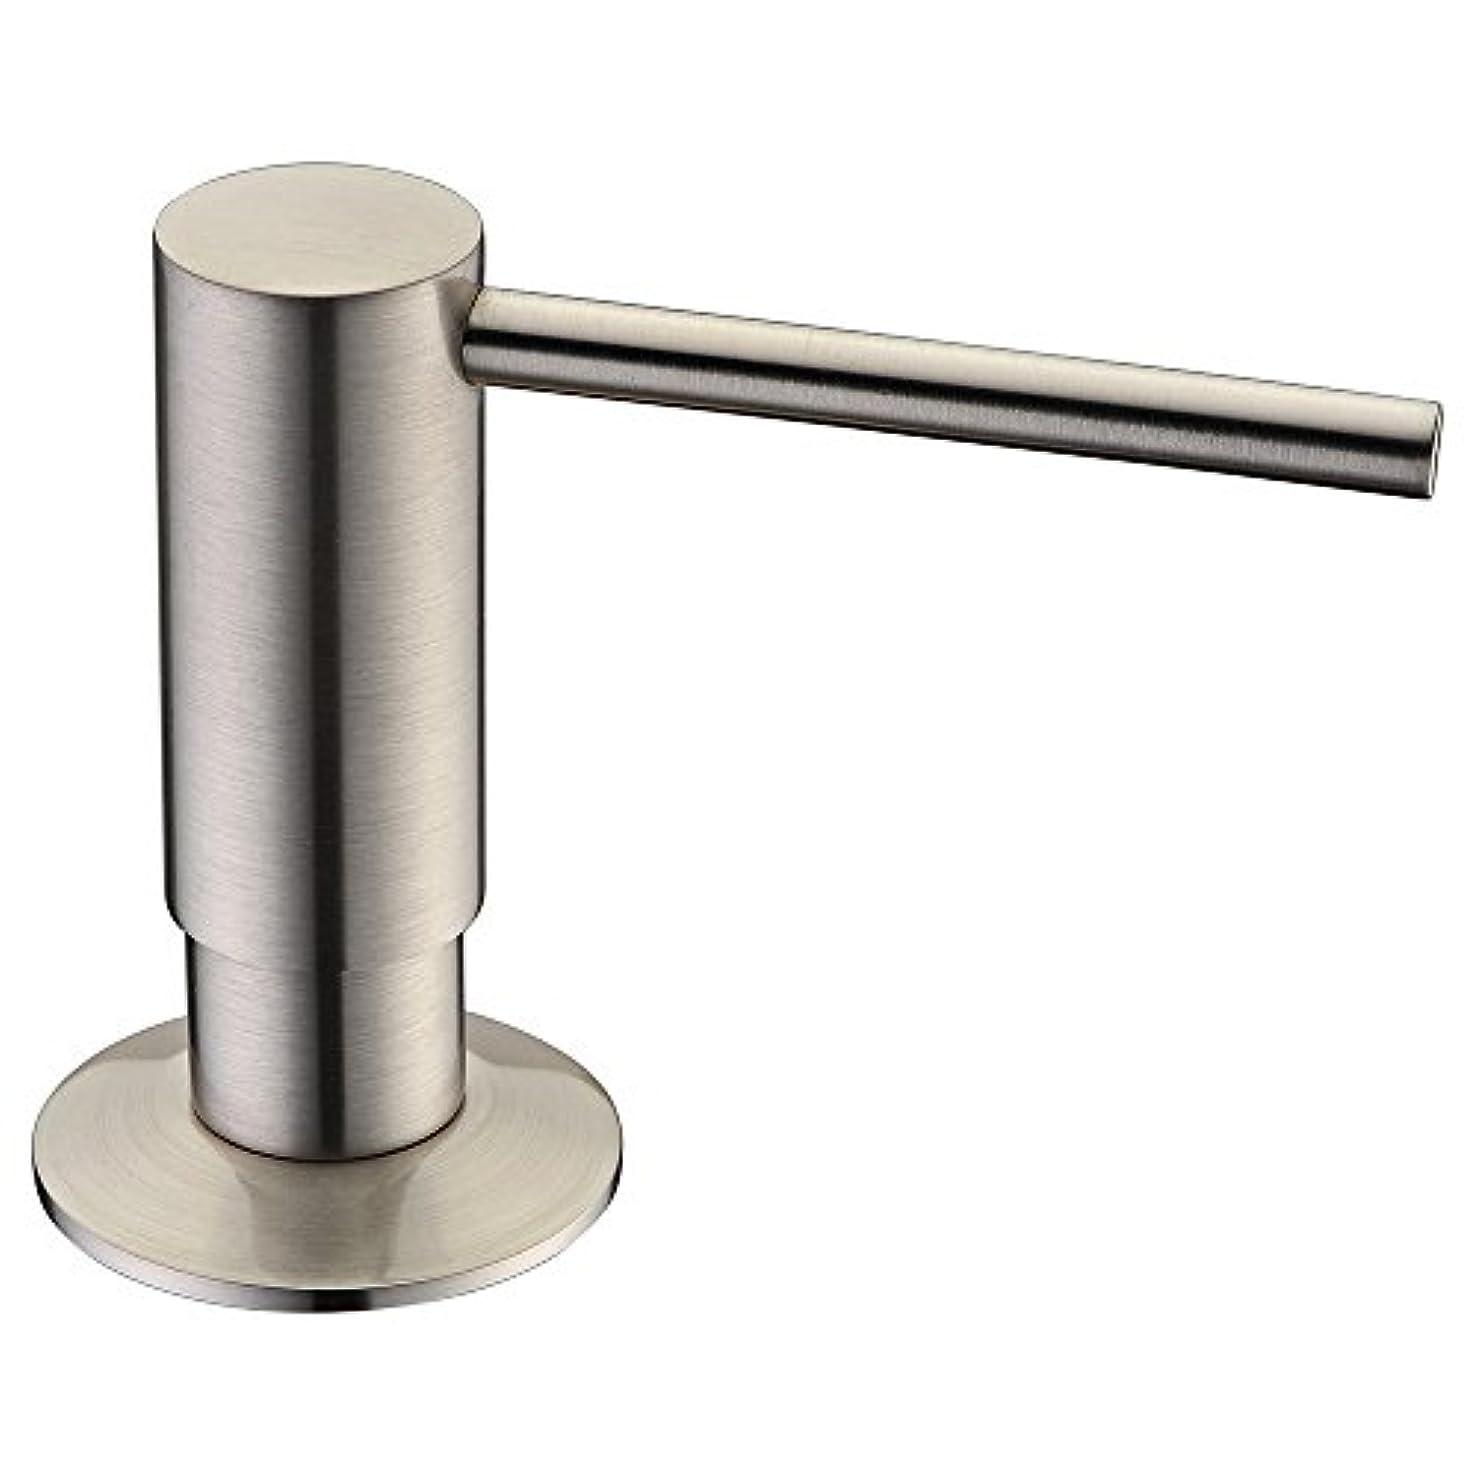 Soap Dispenser,Avola Solid Brass Pump Head Kitchen Sink Soap Dispenser,Brushed Nickel